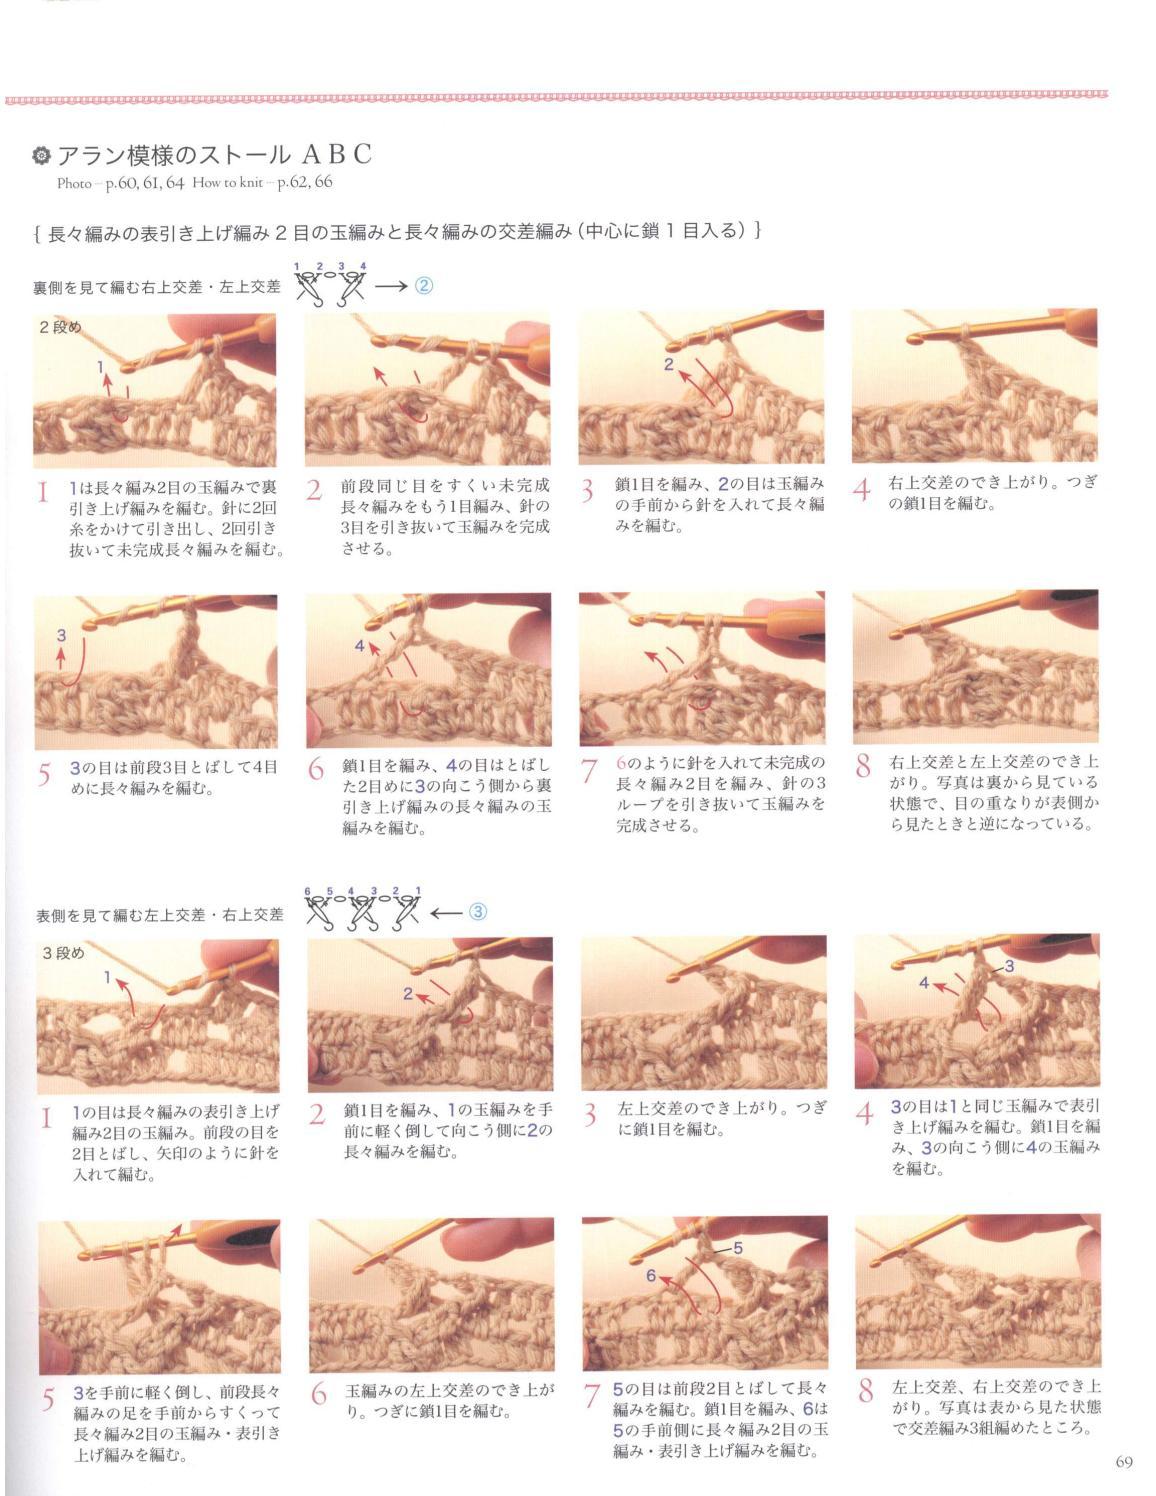 Asahi original crochet best selection 2012 page 69